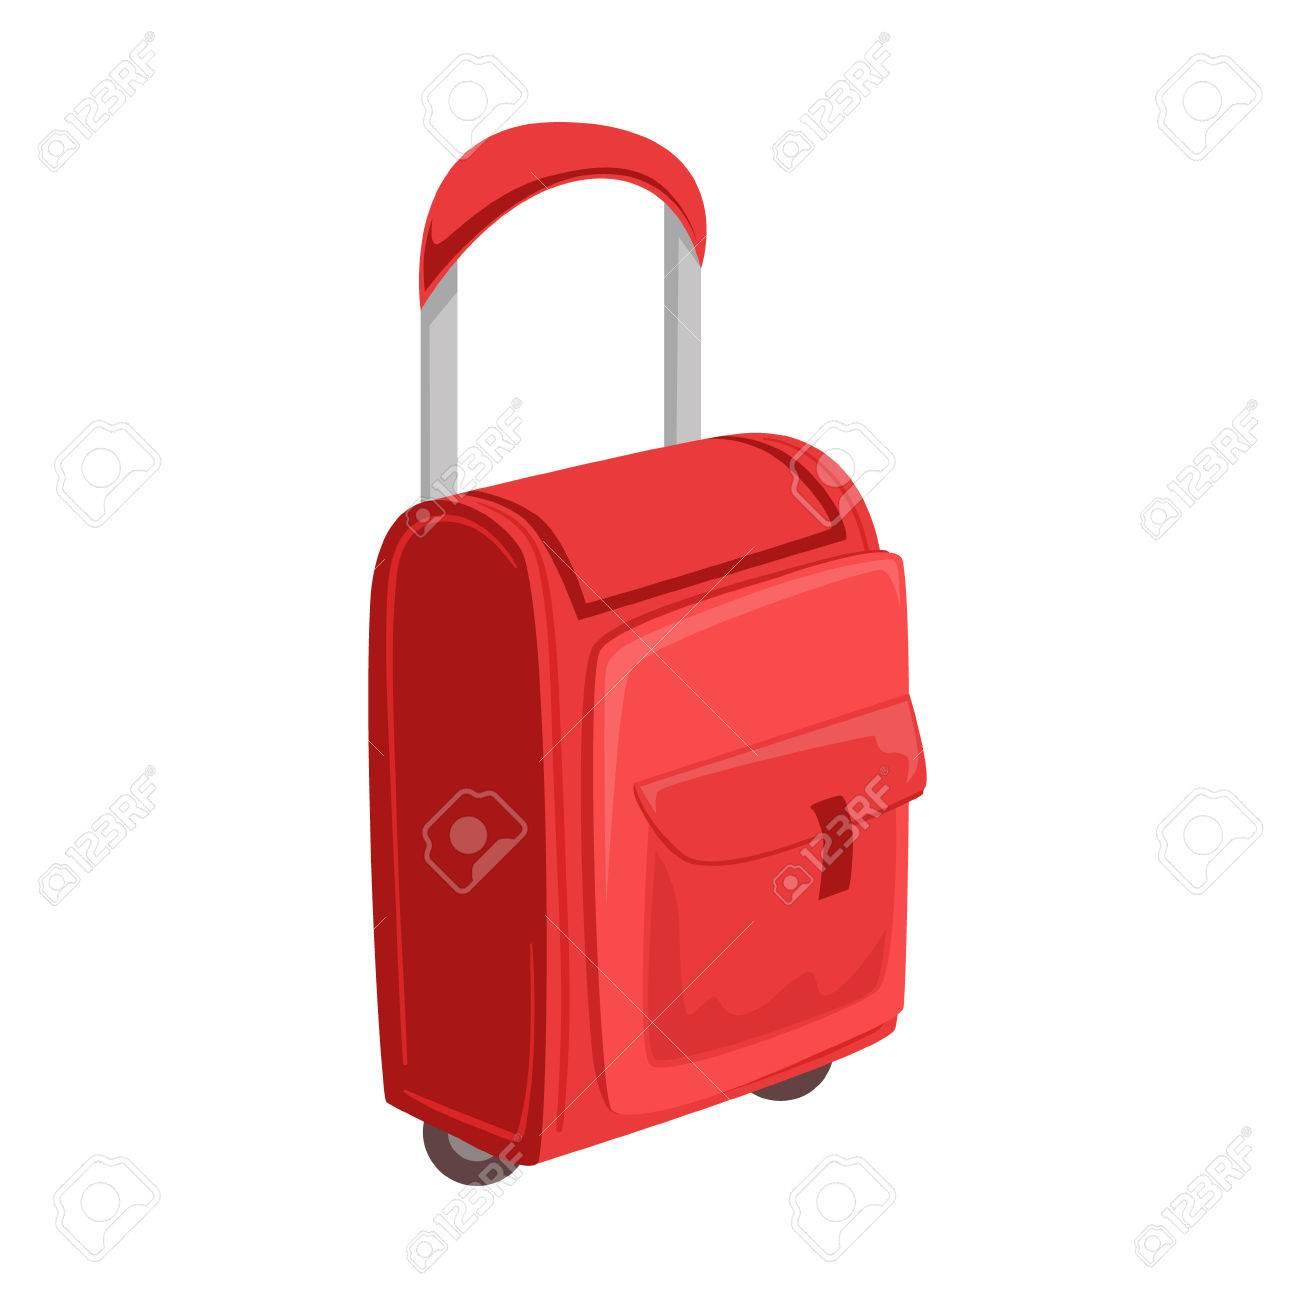 3016fc6aa 67199065-pequeña-maleta -roja-con-bolsillos-en-las-ruedas-con-asa-telescópica-elemento-de-equipaje -colección-de-dibujos.jpg